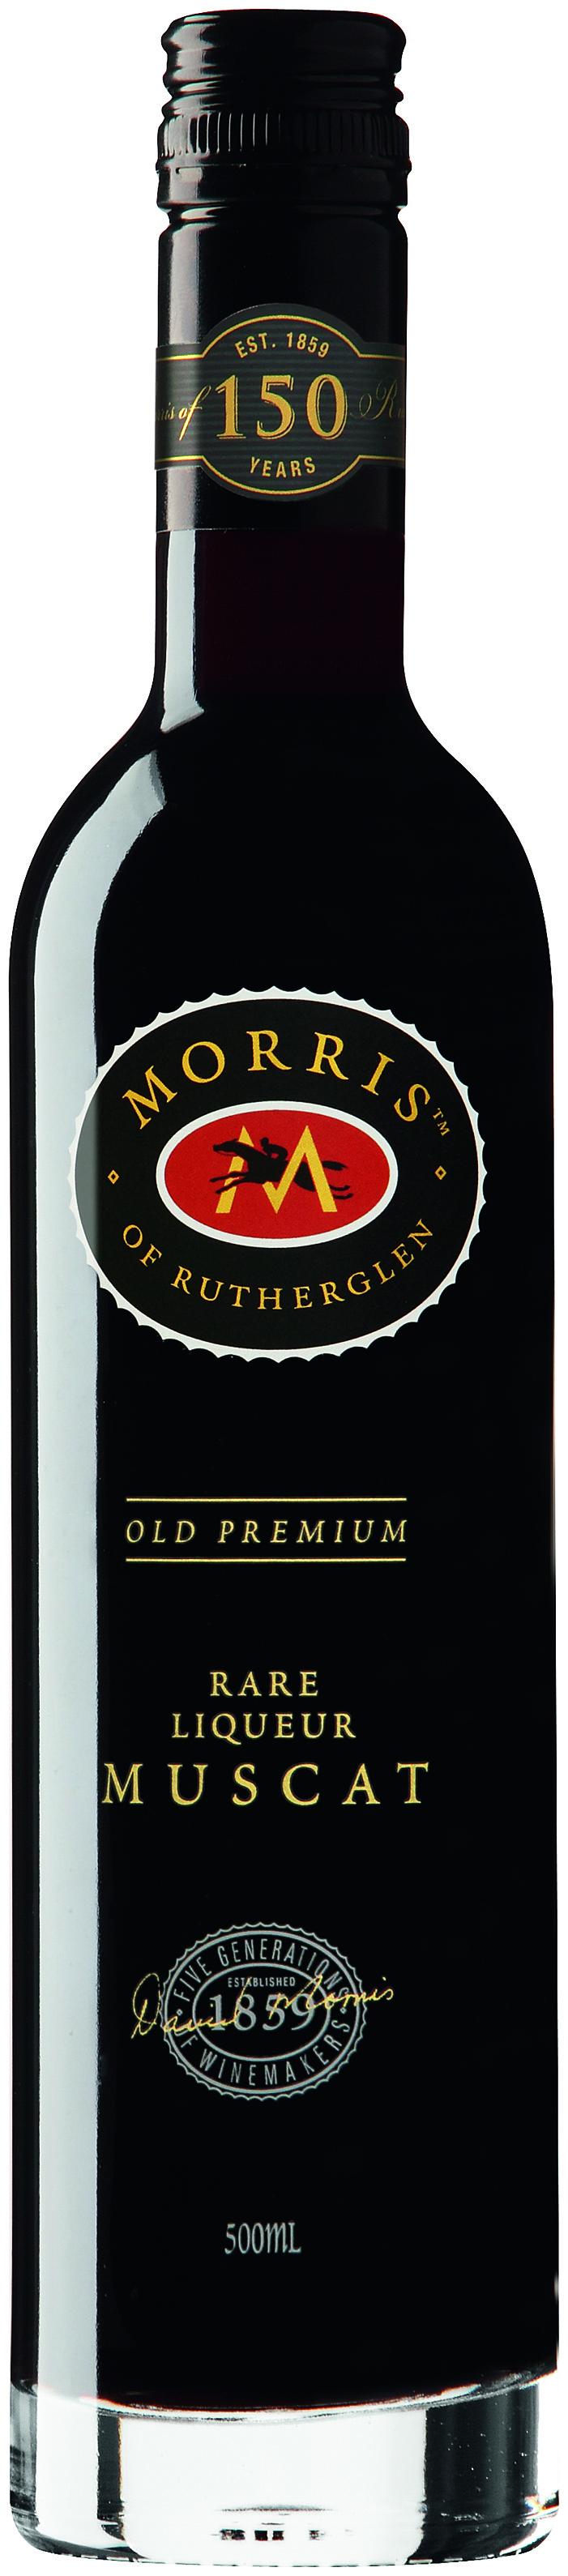 Morris of Rutherglen, Old Premium Rare Liqueur Muscat NV